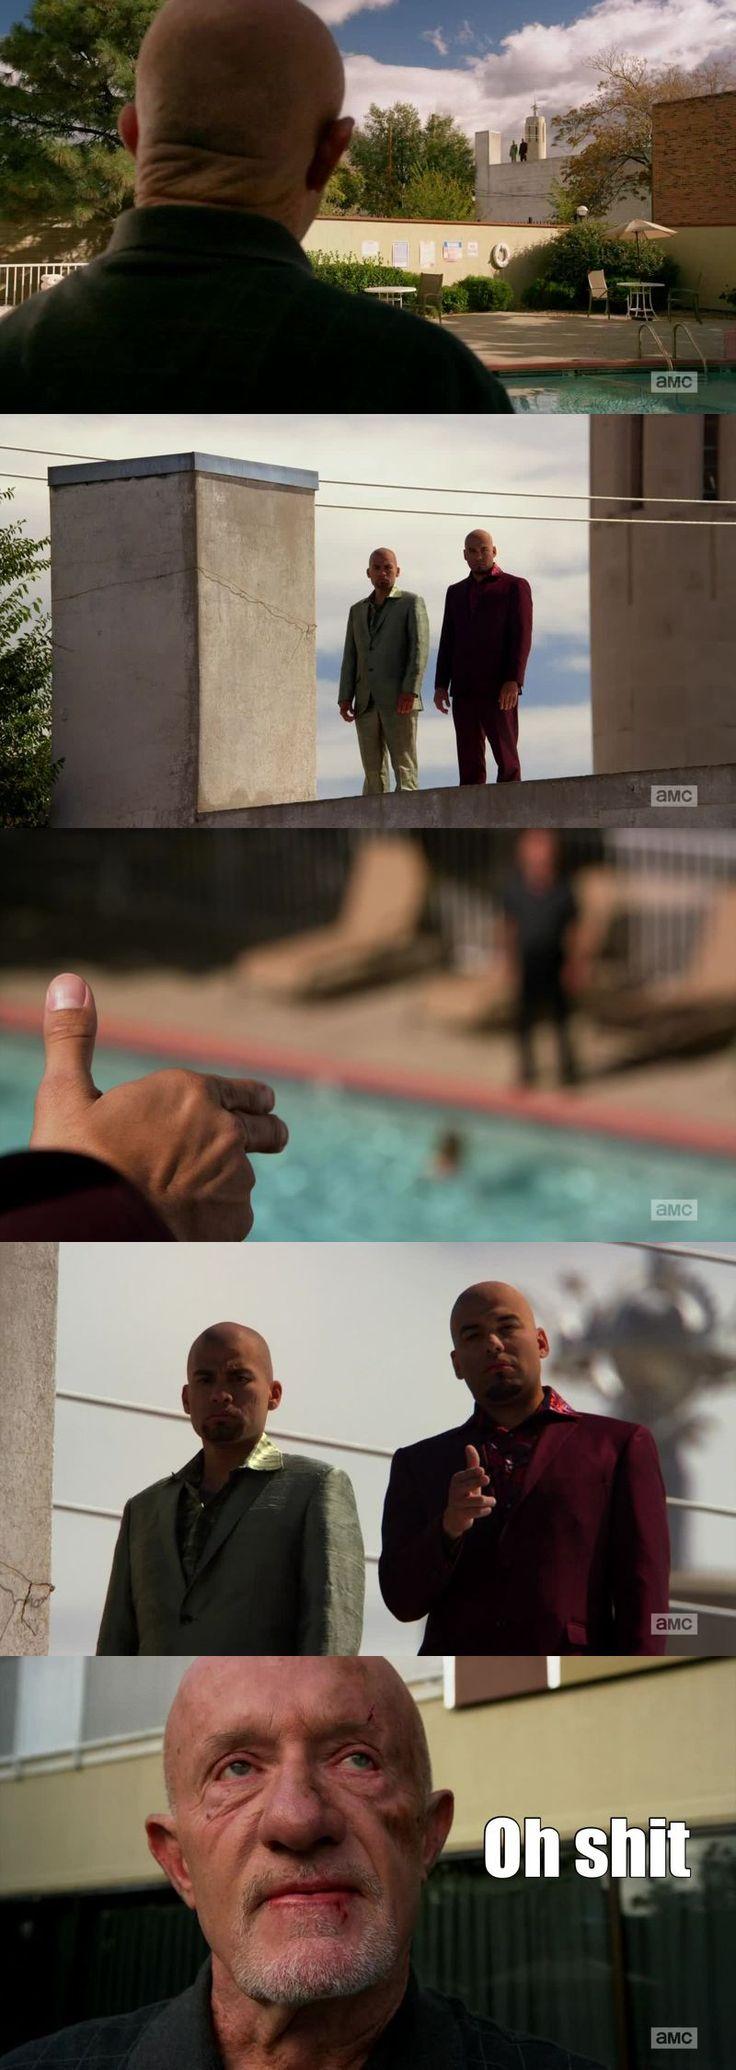 TVShow Time - Better Call Saul S02E06 - Bali Ha'i